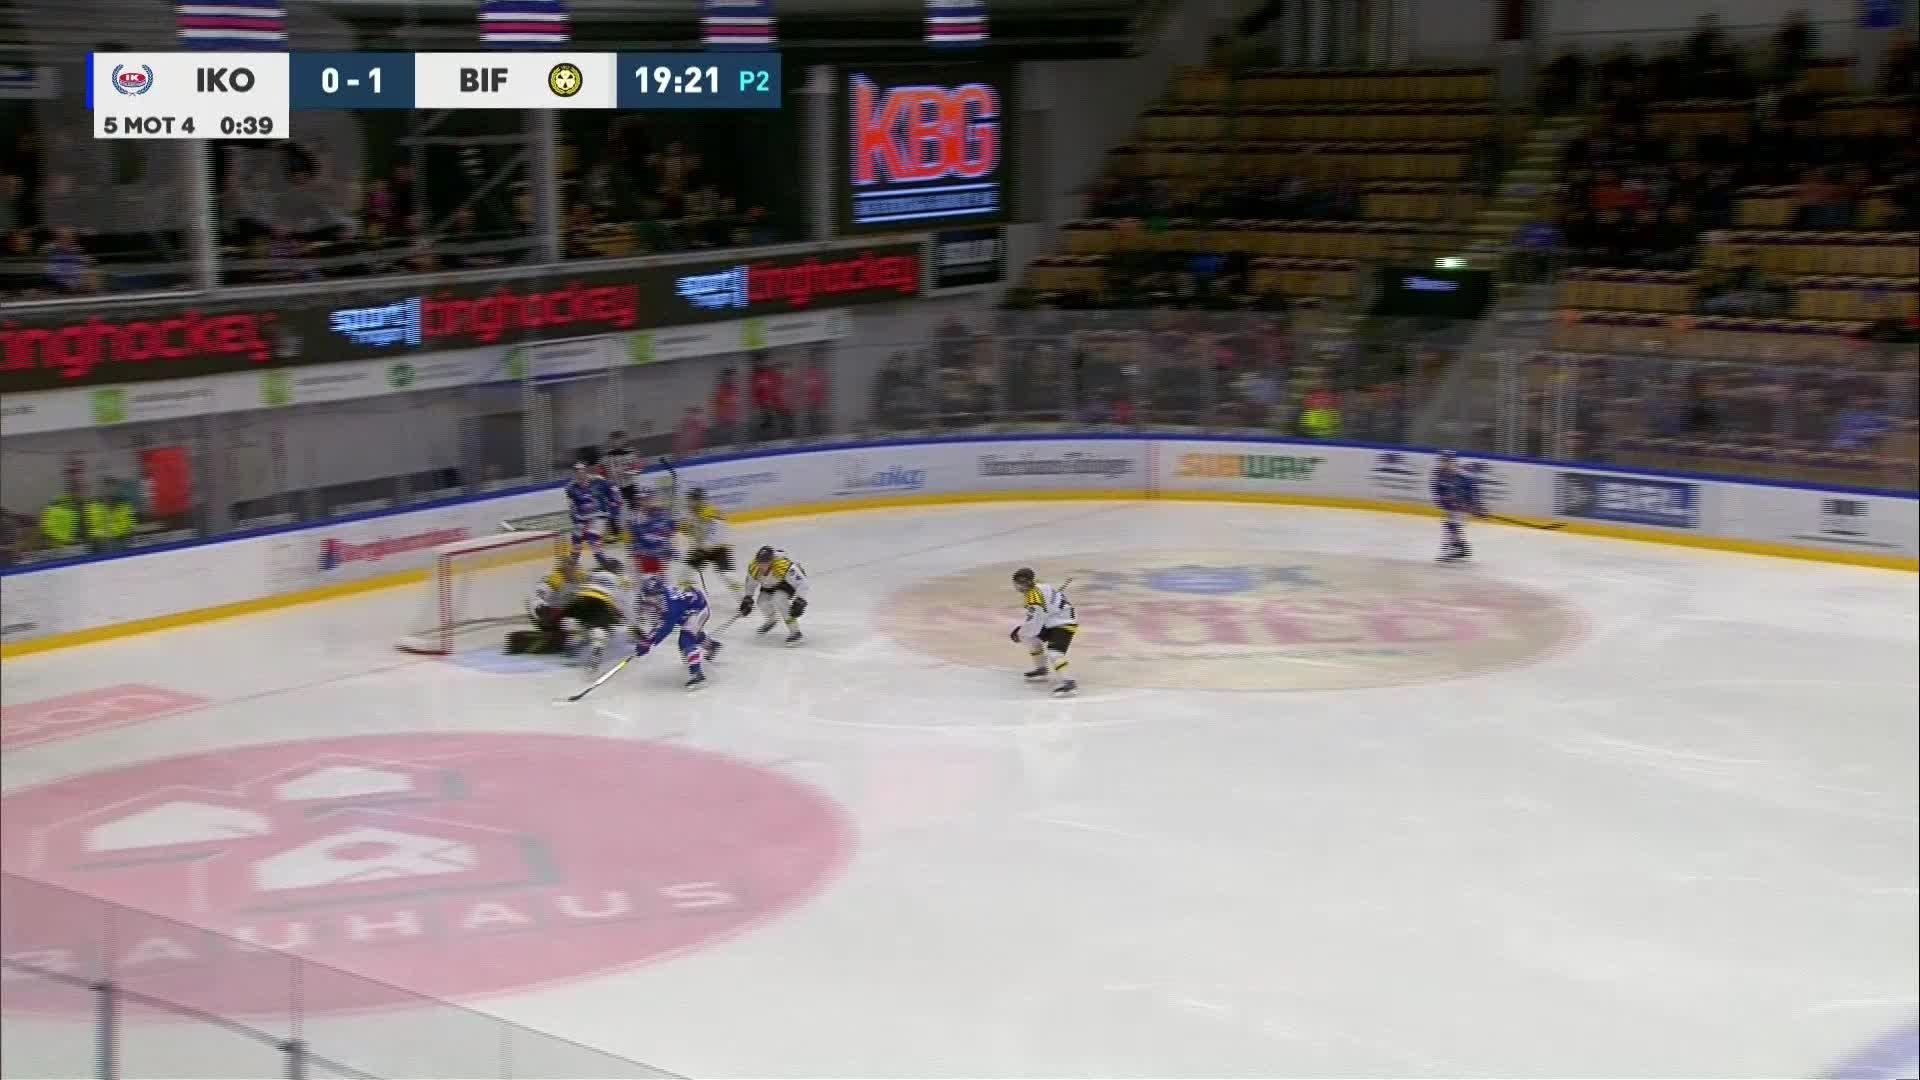 IK Oskarshamn - Brynäs IF 1-1